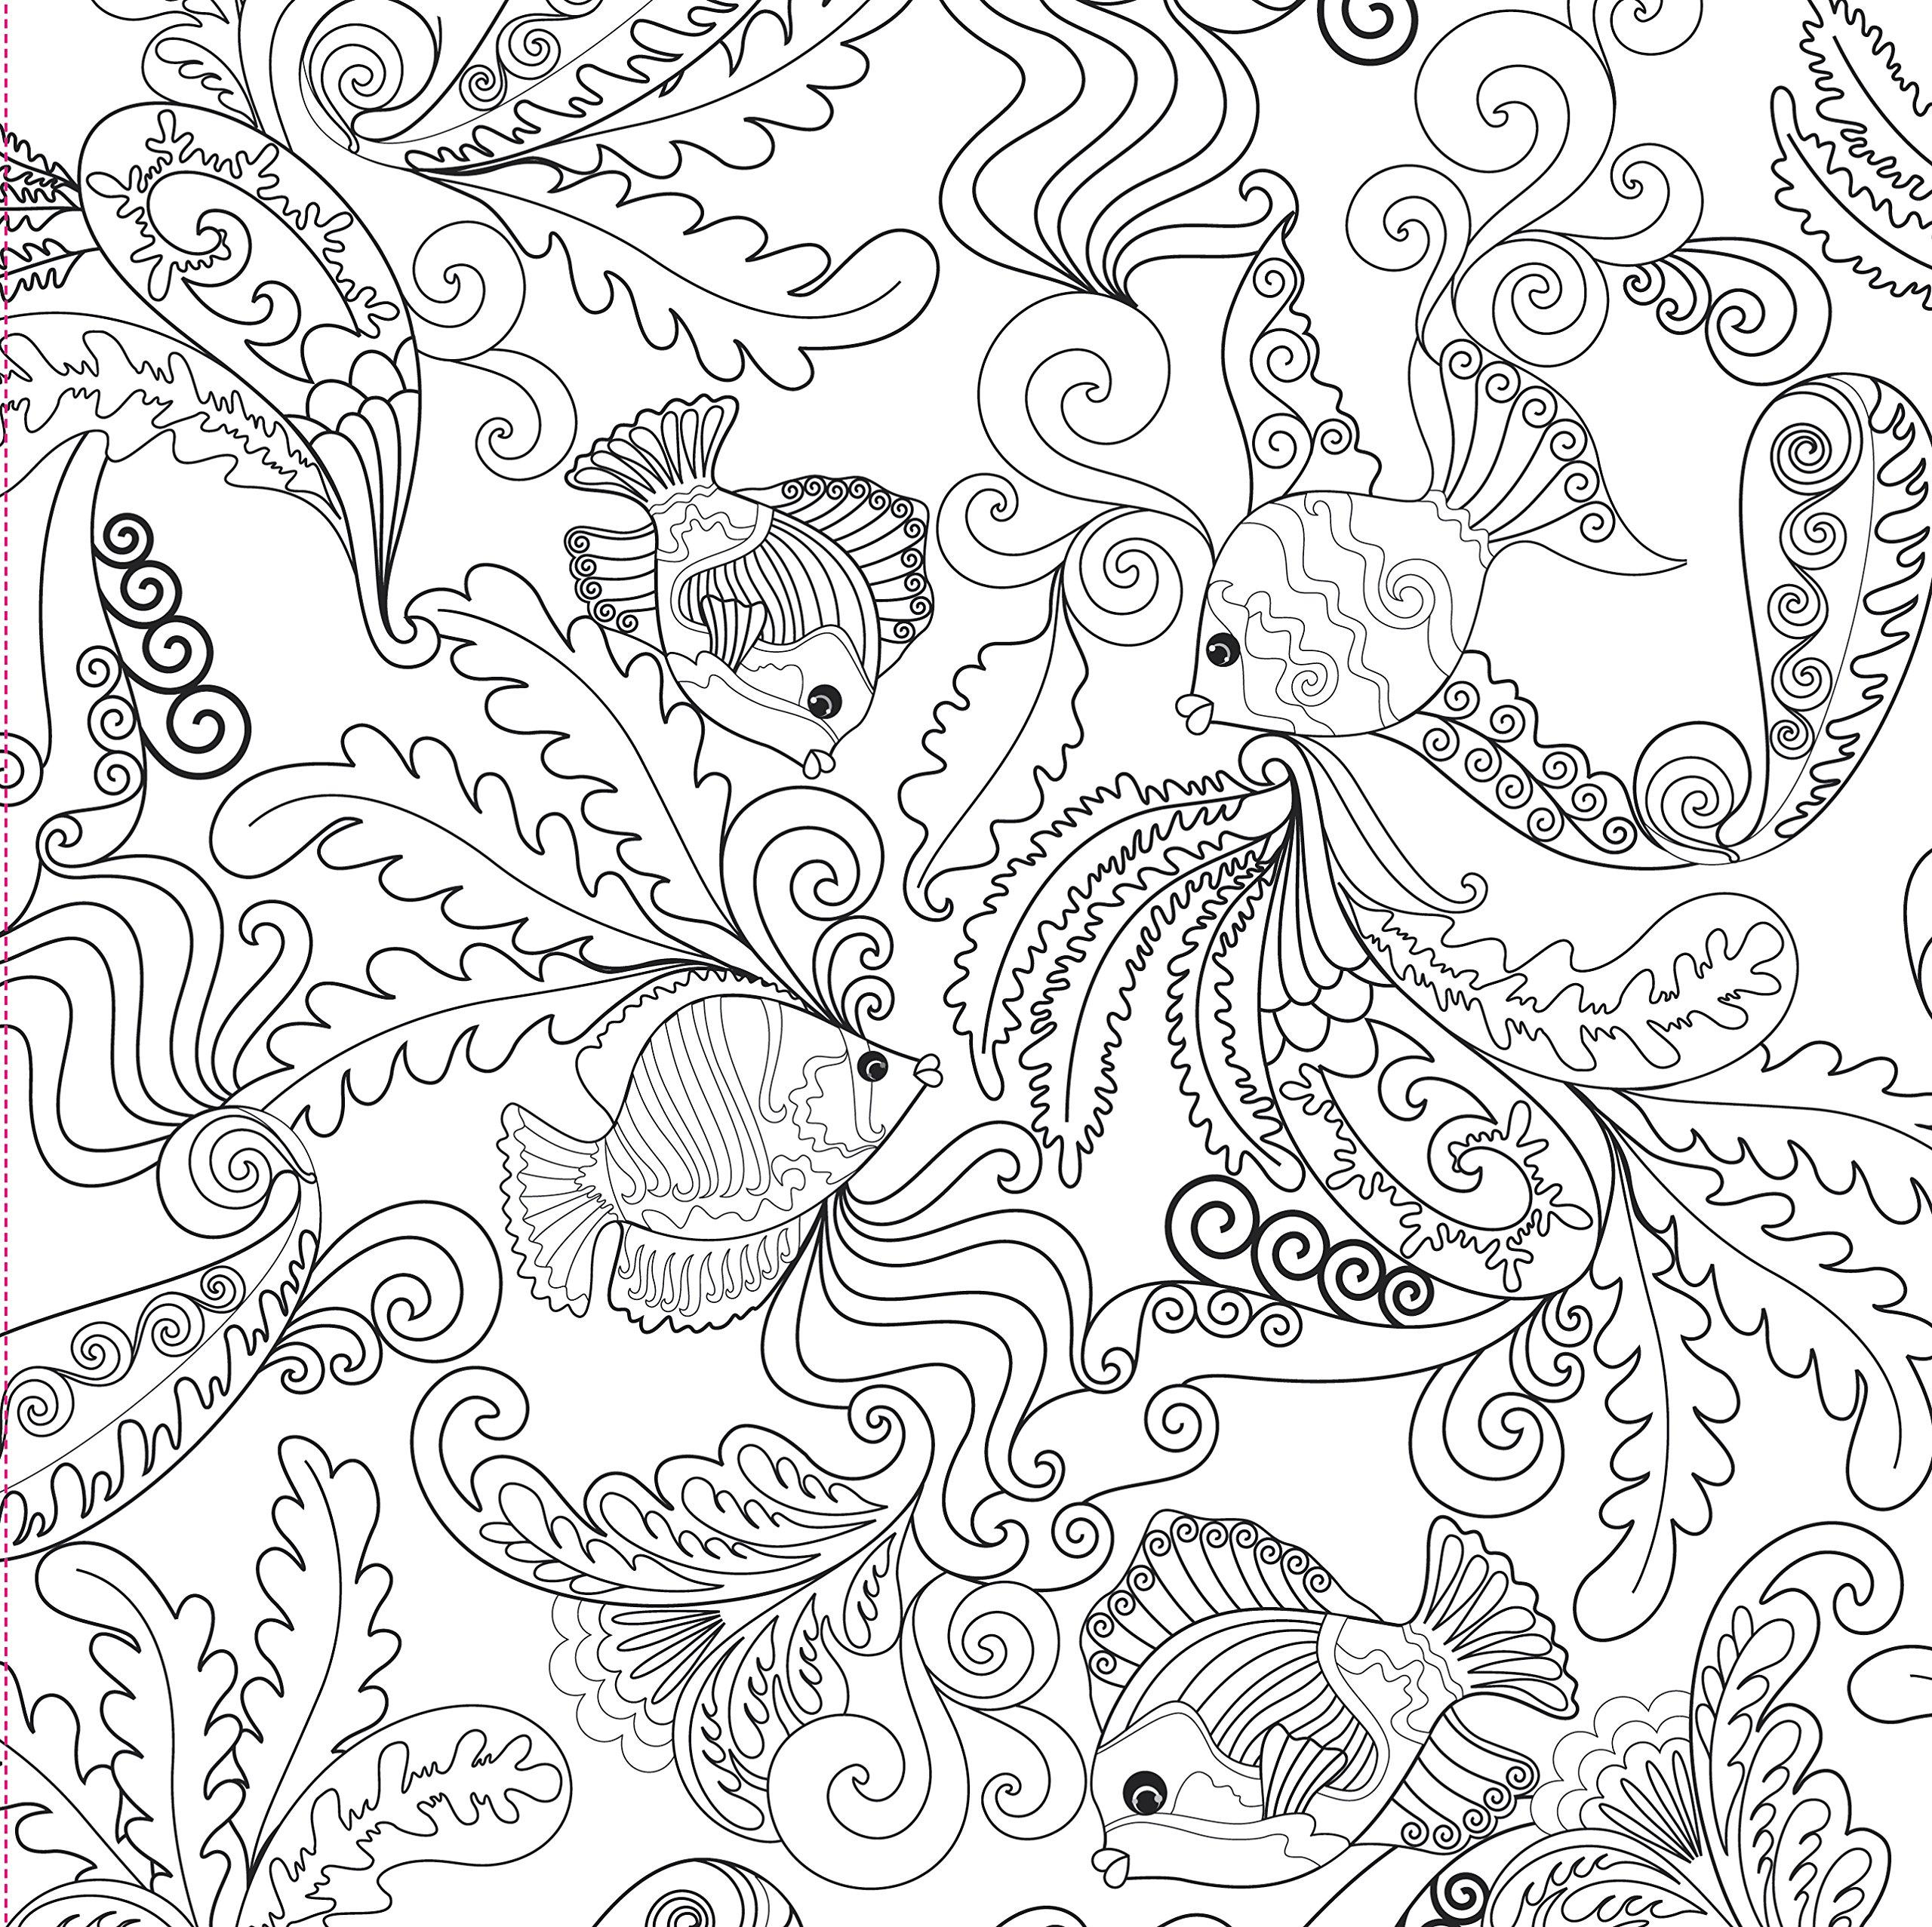 Ocean Drawing For Kids At Getdrawings